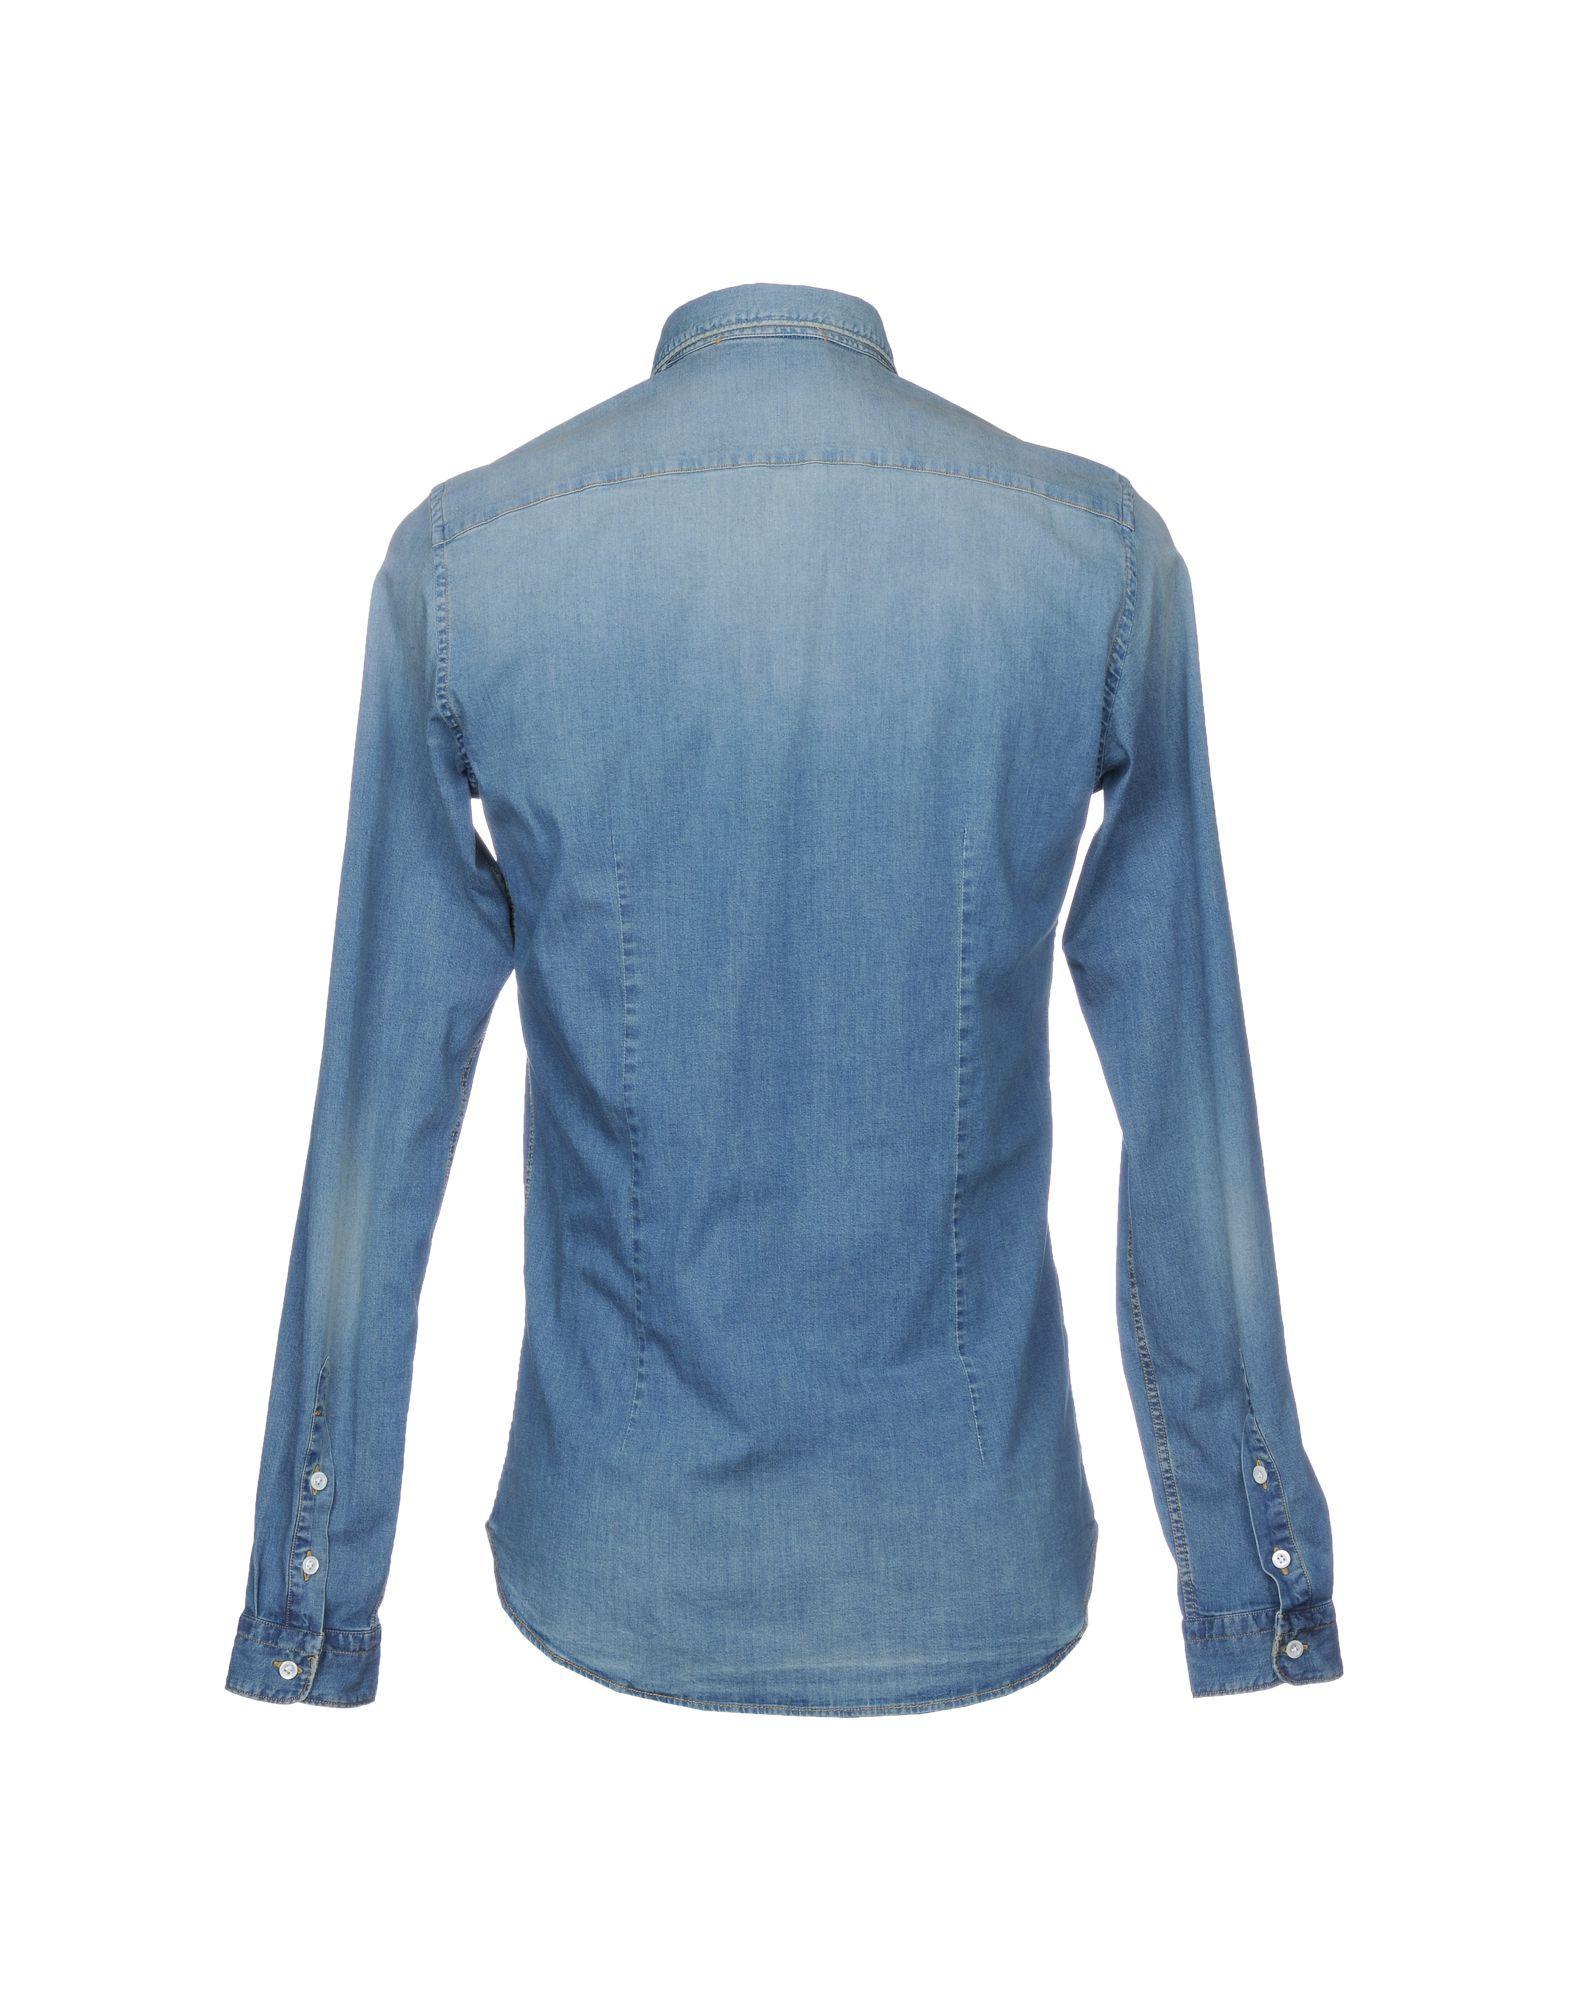 Aglini Blue Denim Shirt